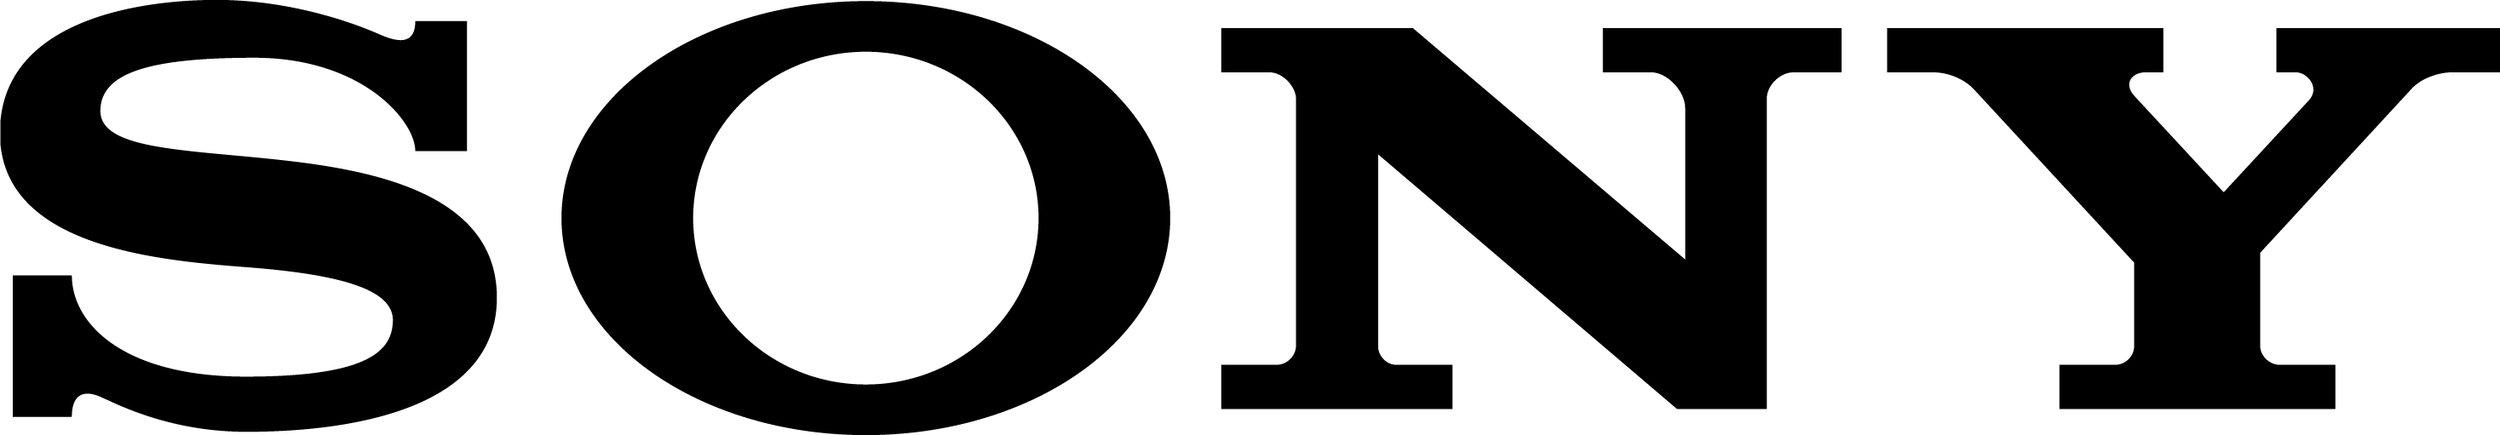 SONY Logo Blk no rego.jpg